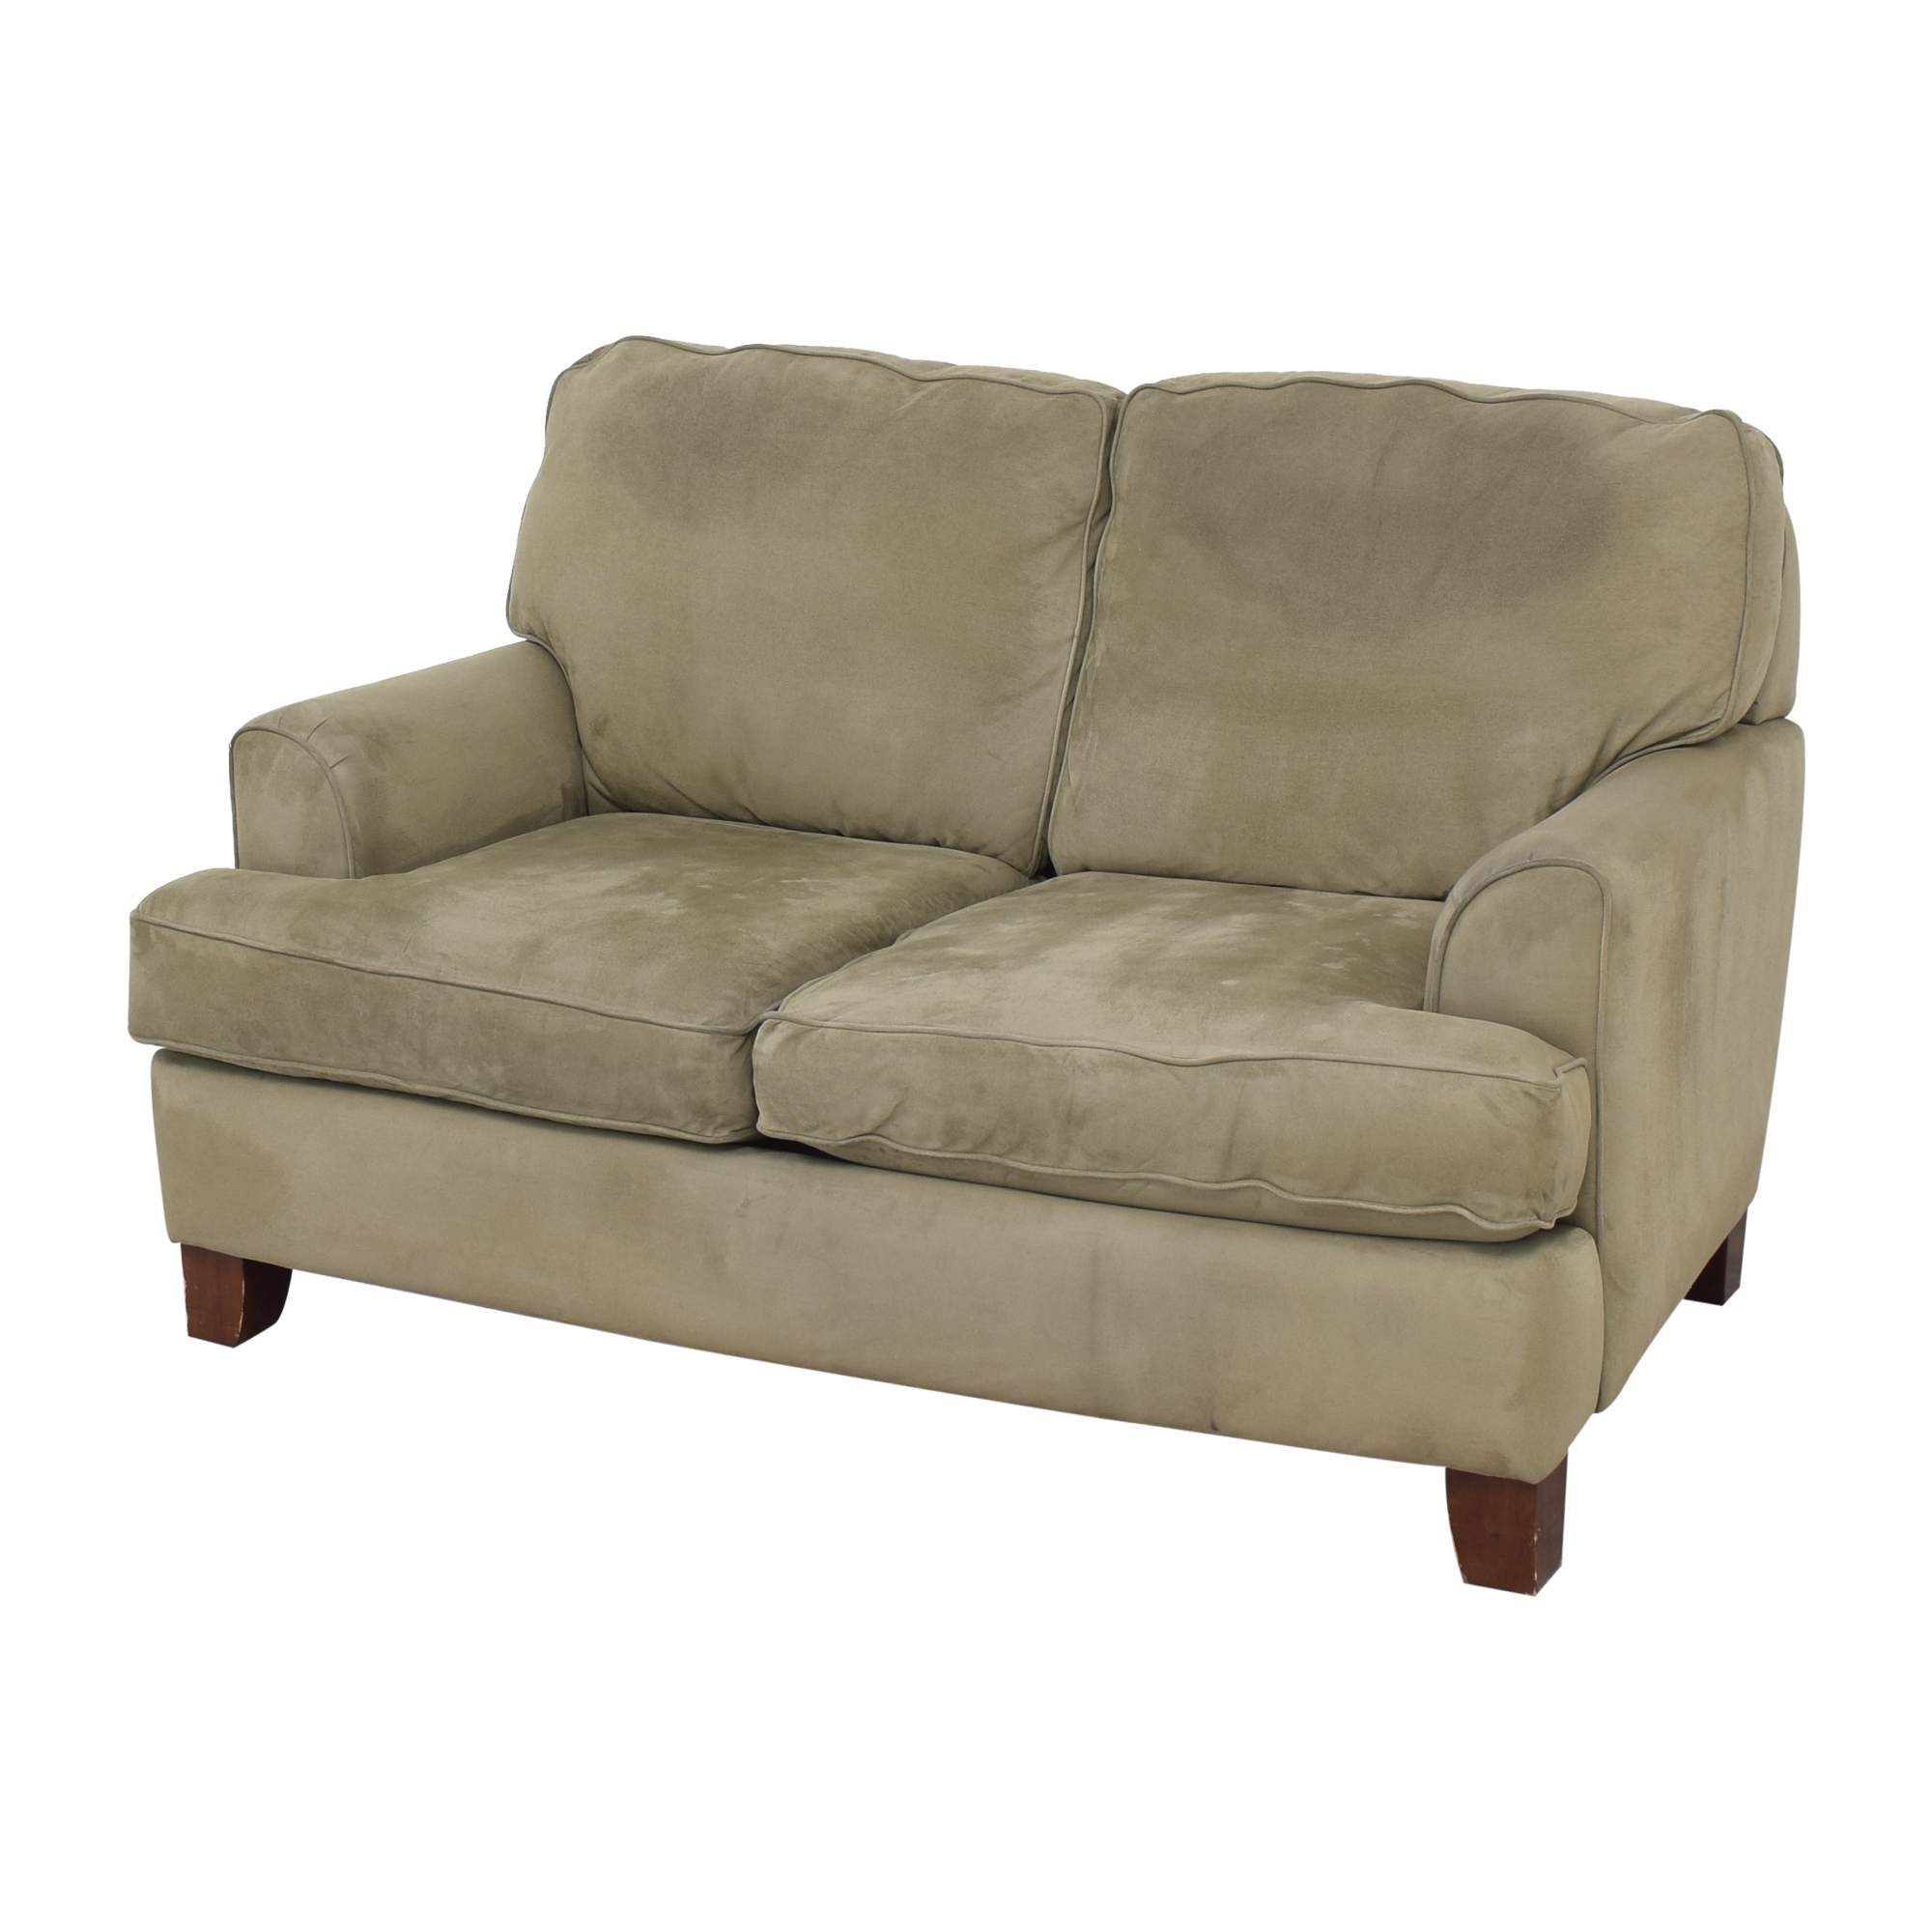 buy JC Penney Two Cushion Loveseat JC Penney